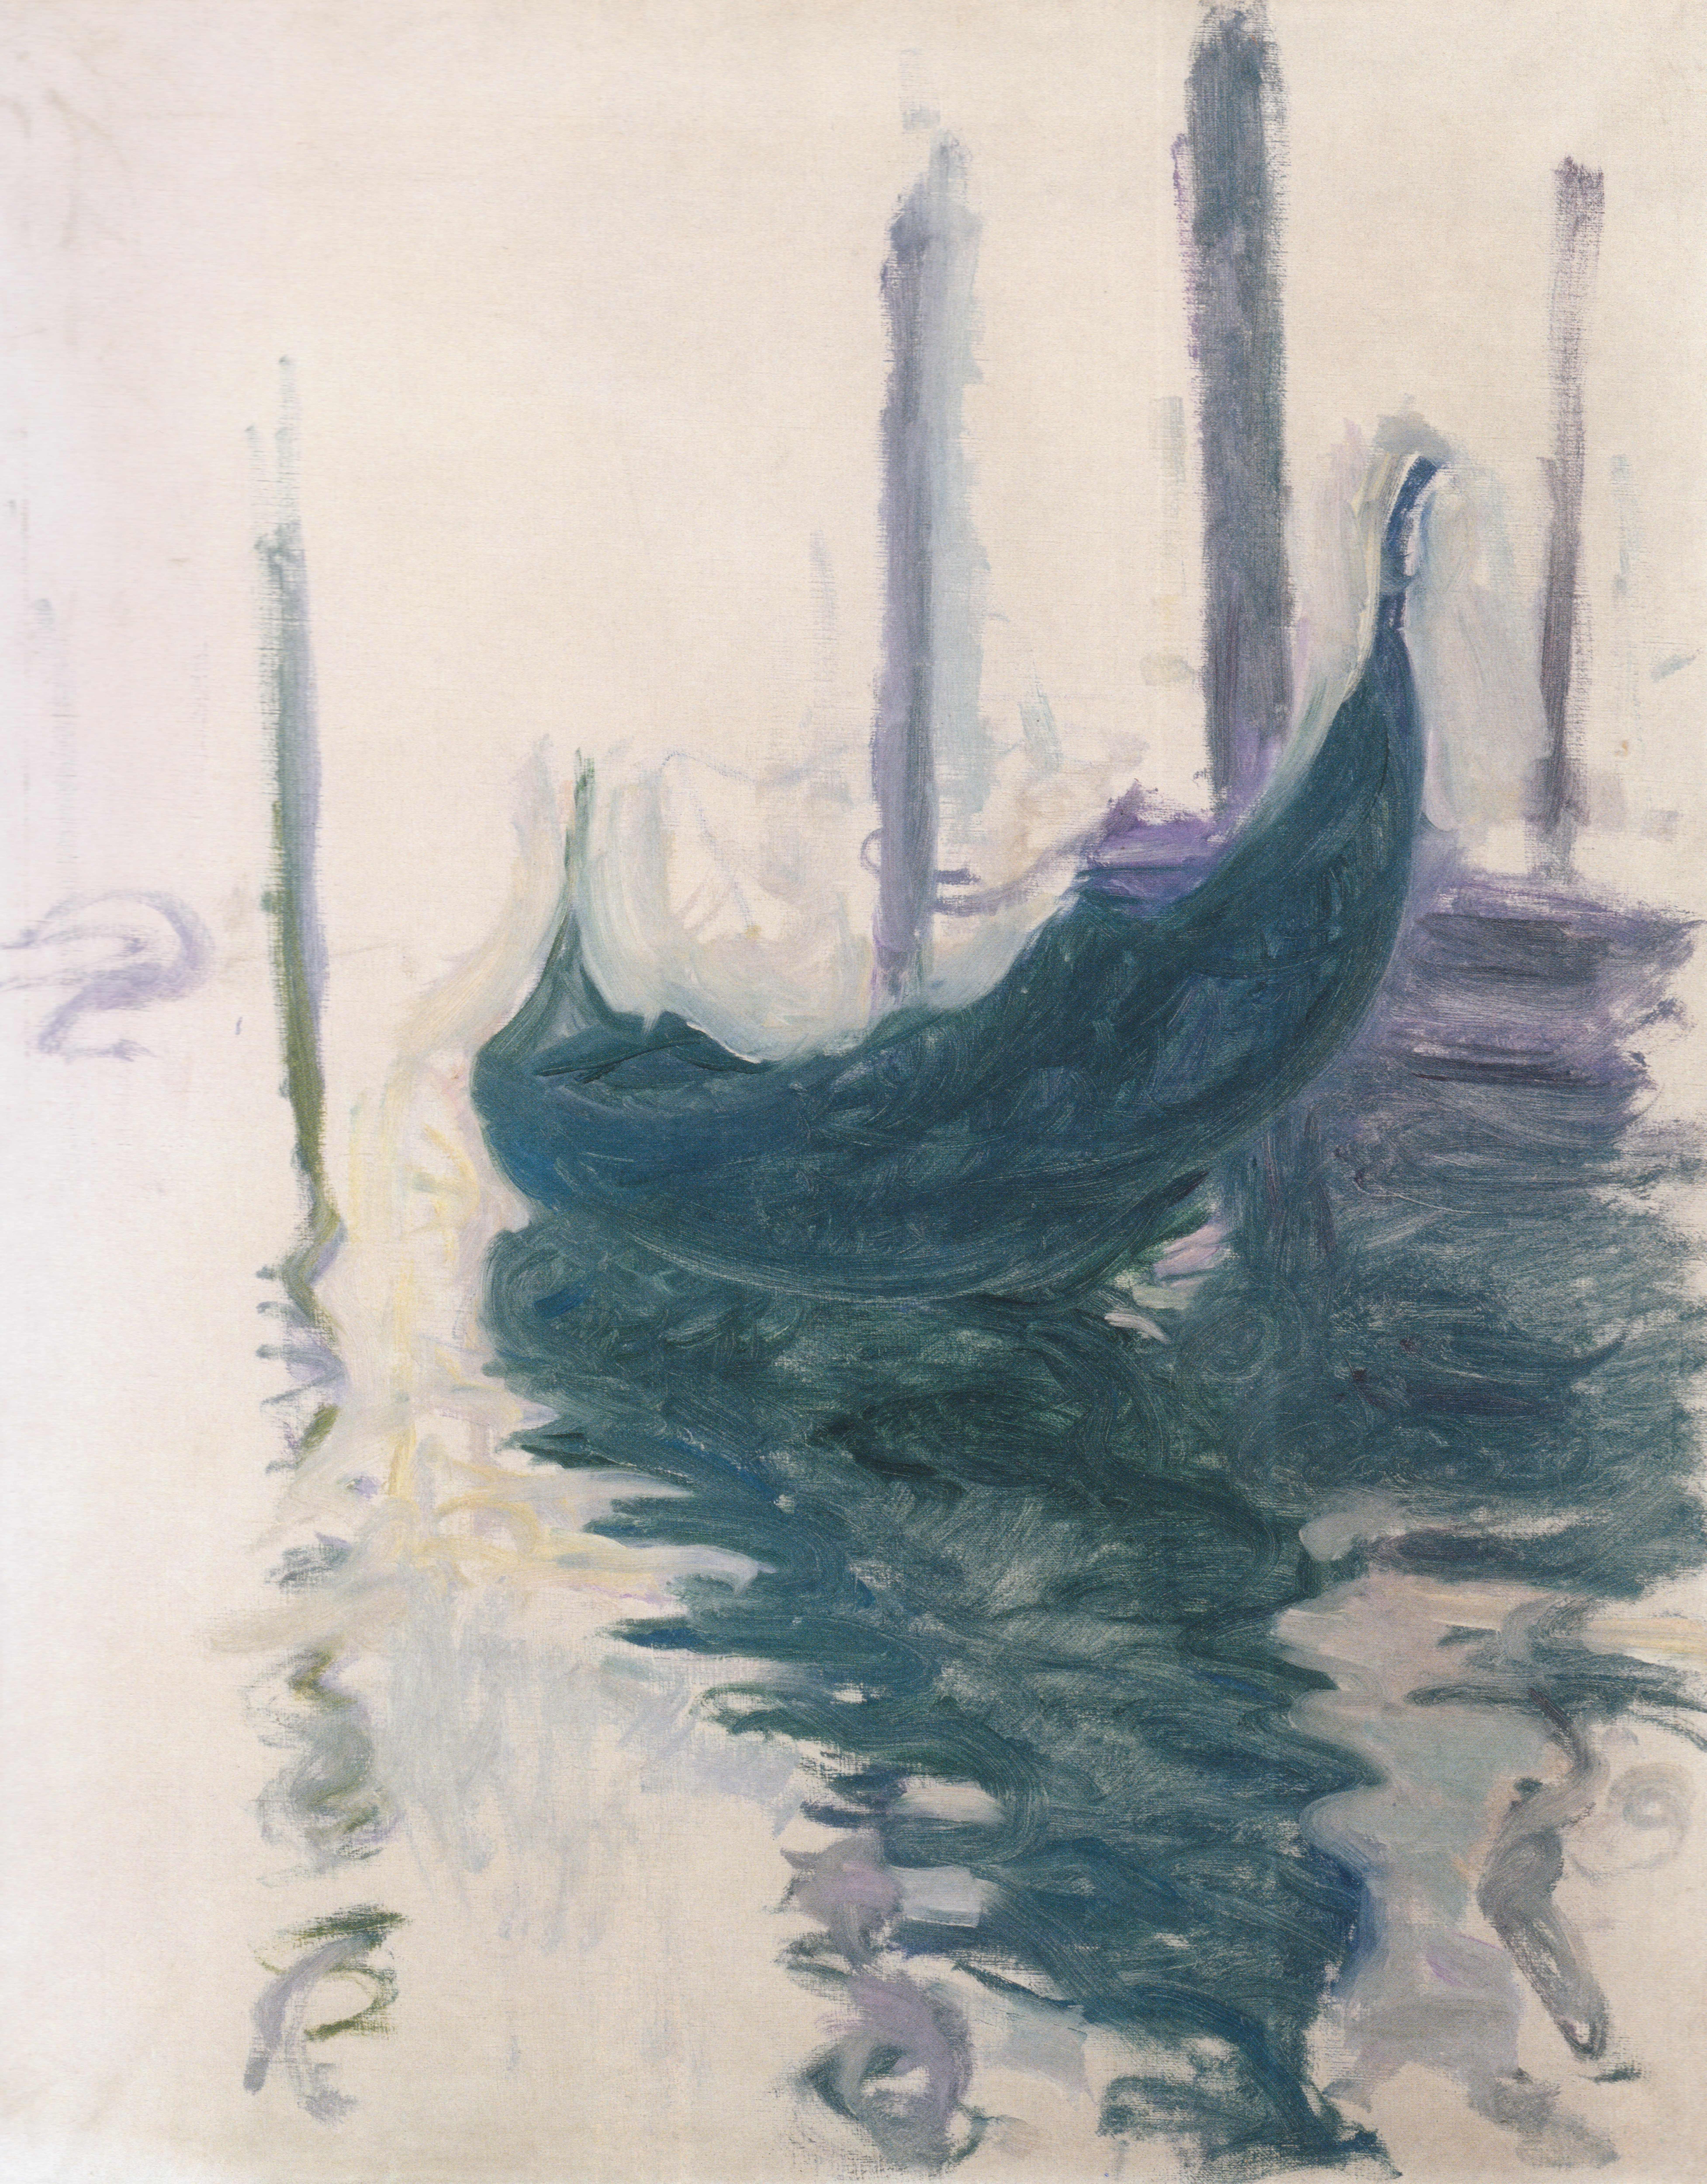 File:Gondola in Venice 1908 Claude Monet.jpg - Wikimedia Commons